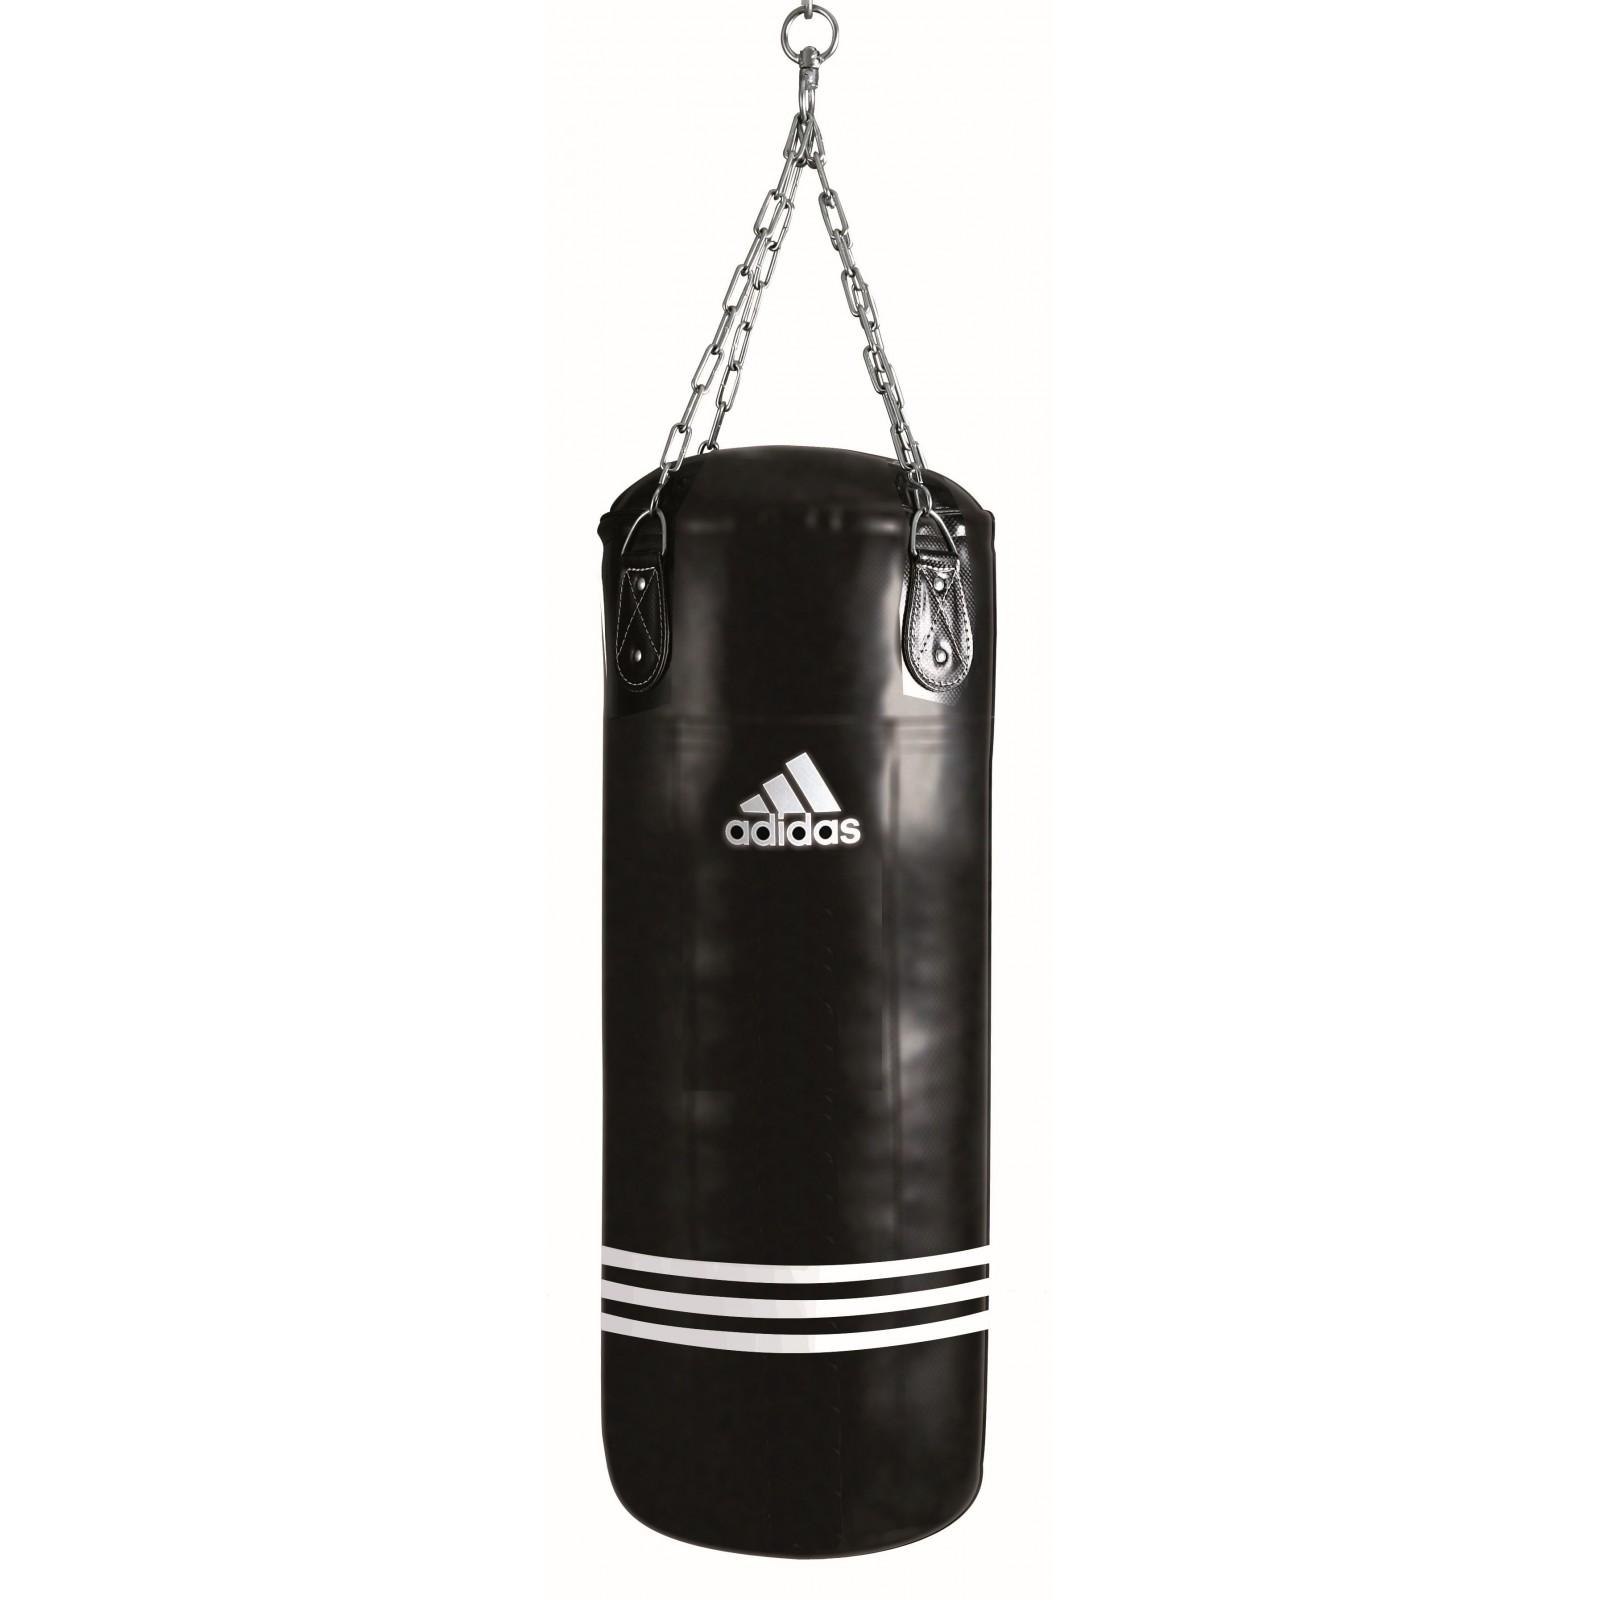 72b6805aa19 adidas PU Training Bag 180cm buy with 26 customer ratings - T-Fitness